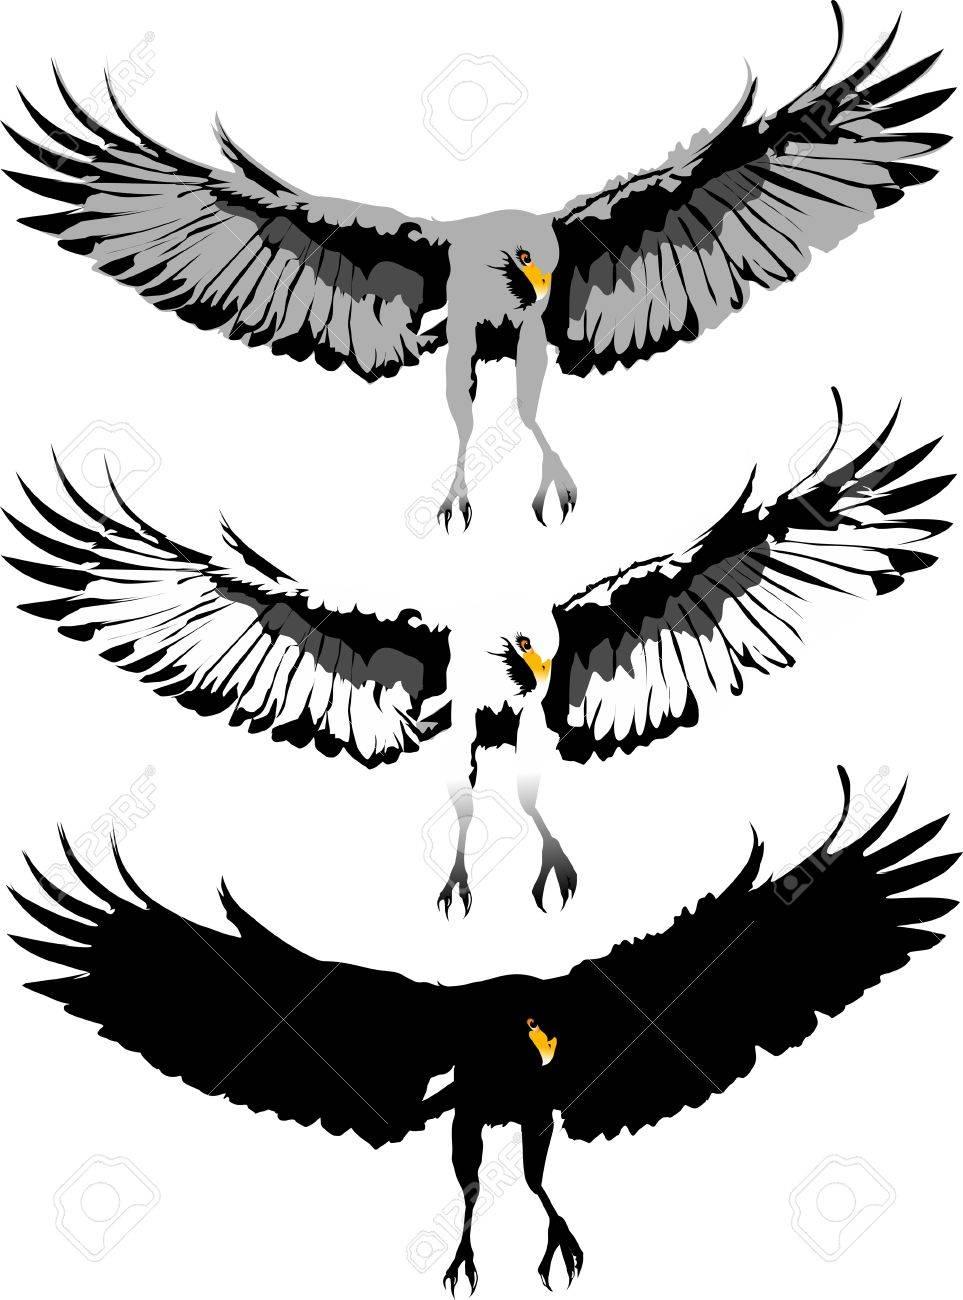 Eagle Claws Clipart Eagle Claws